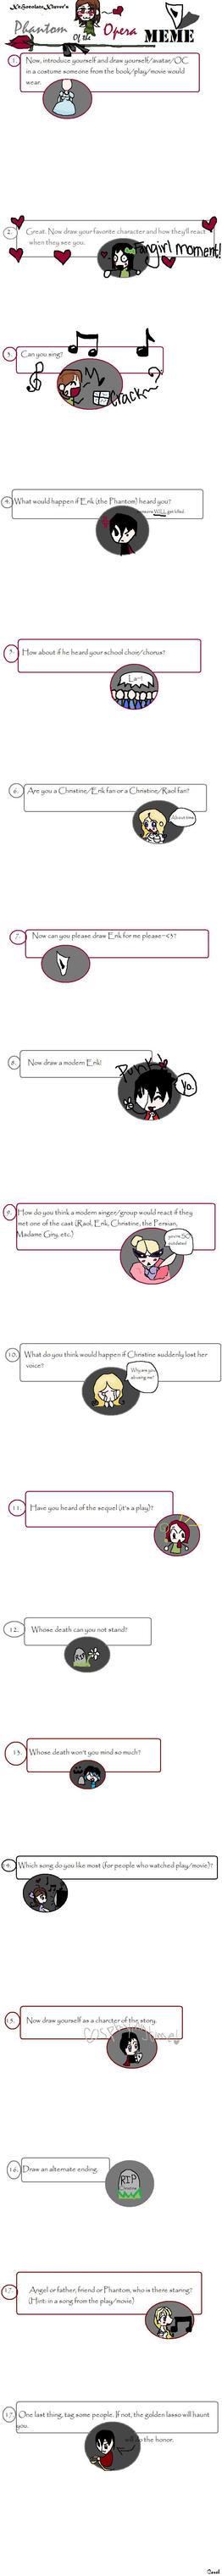 Phantom of the Opera meme by XcHocolateXluver